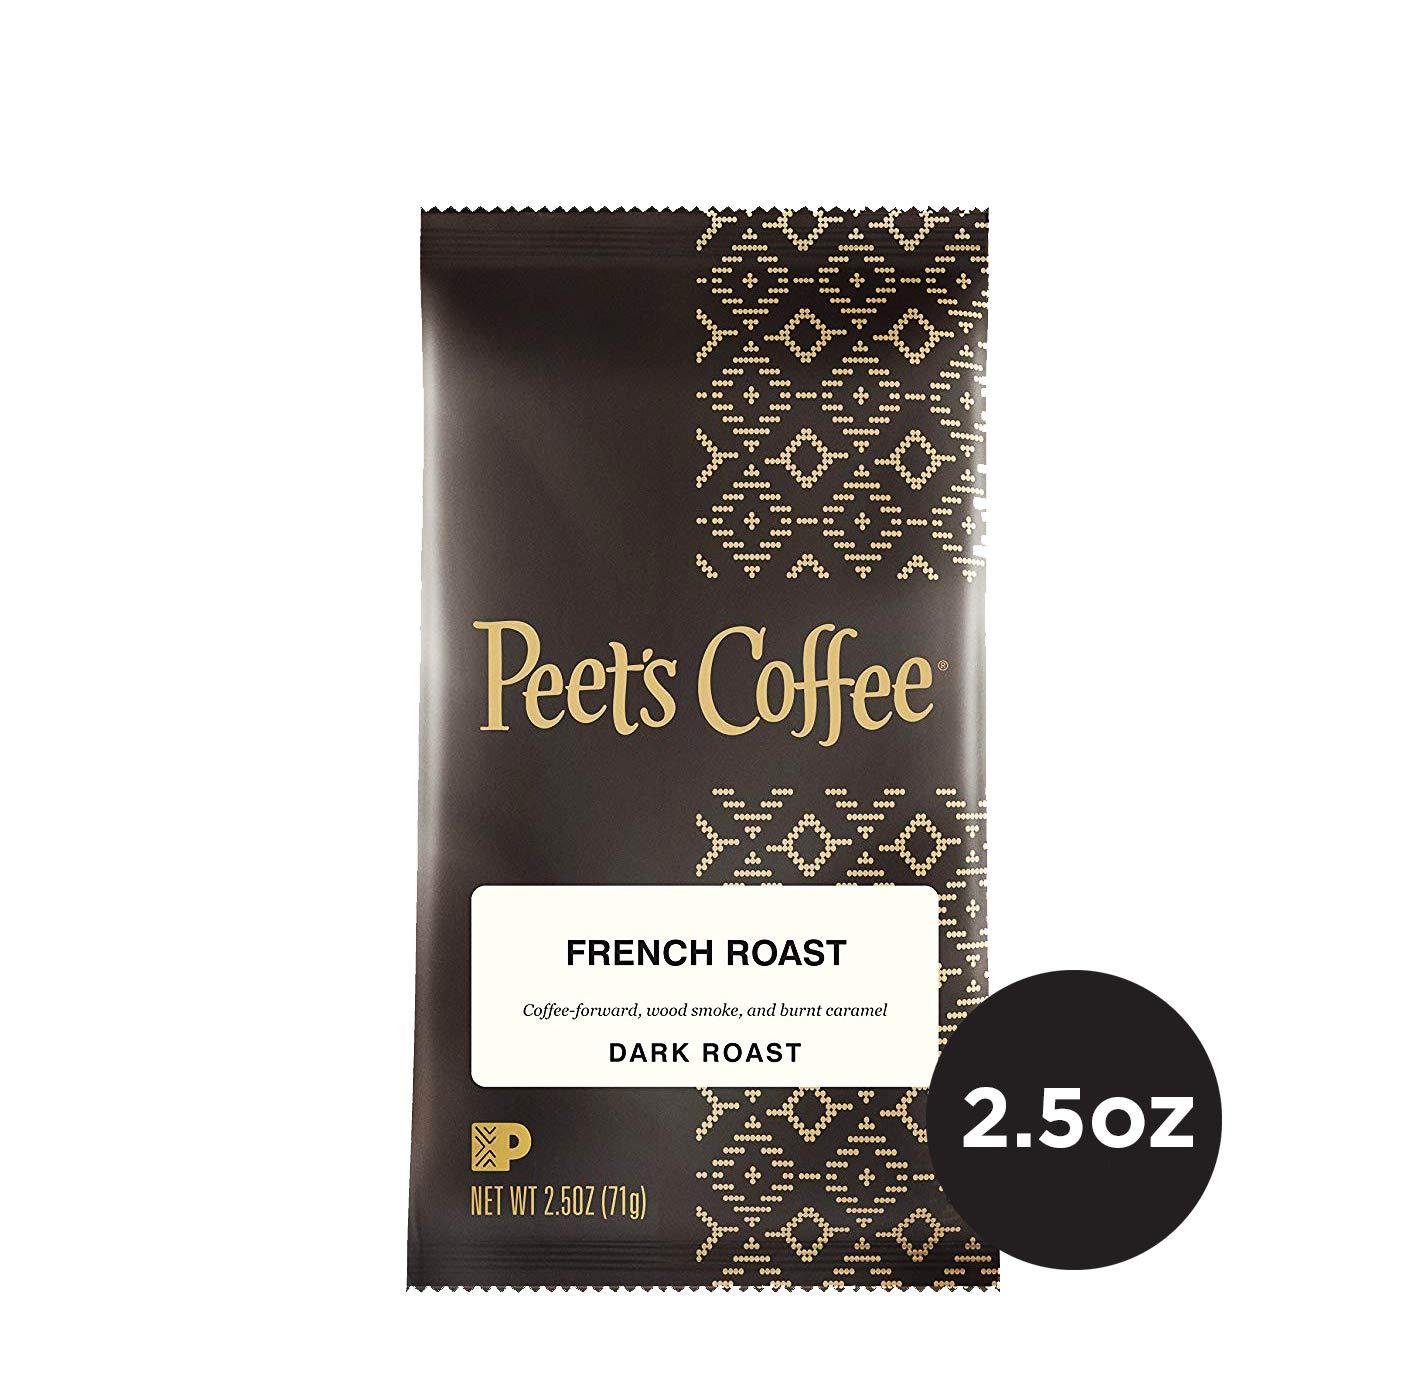 Peet's Coffee French Roast Dark Roast Ground Coffee, 2.5 Ounce Portion Packs (Pack of 18)